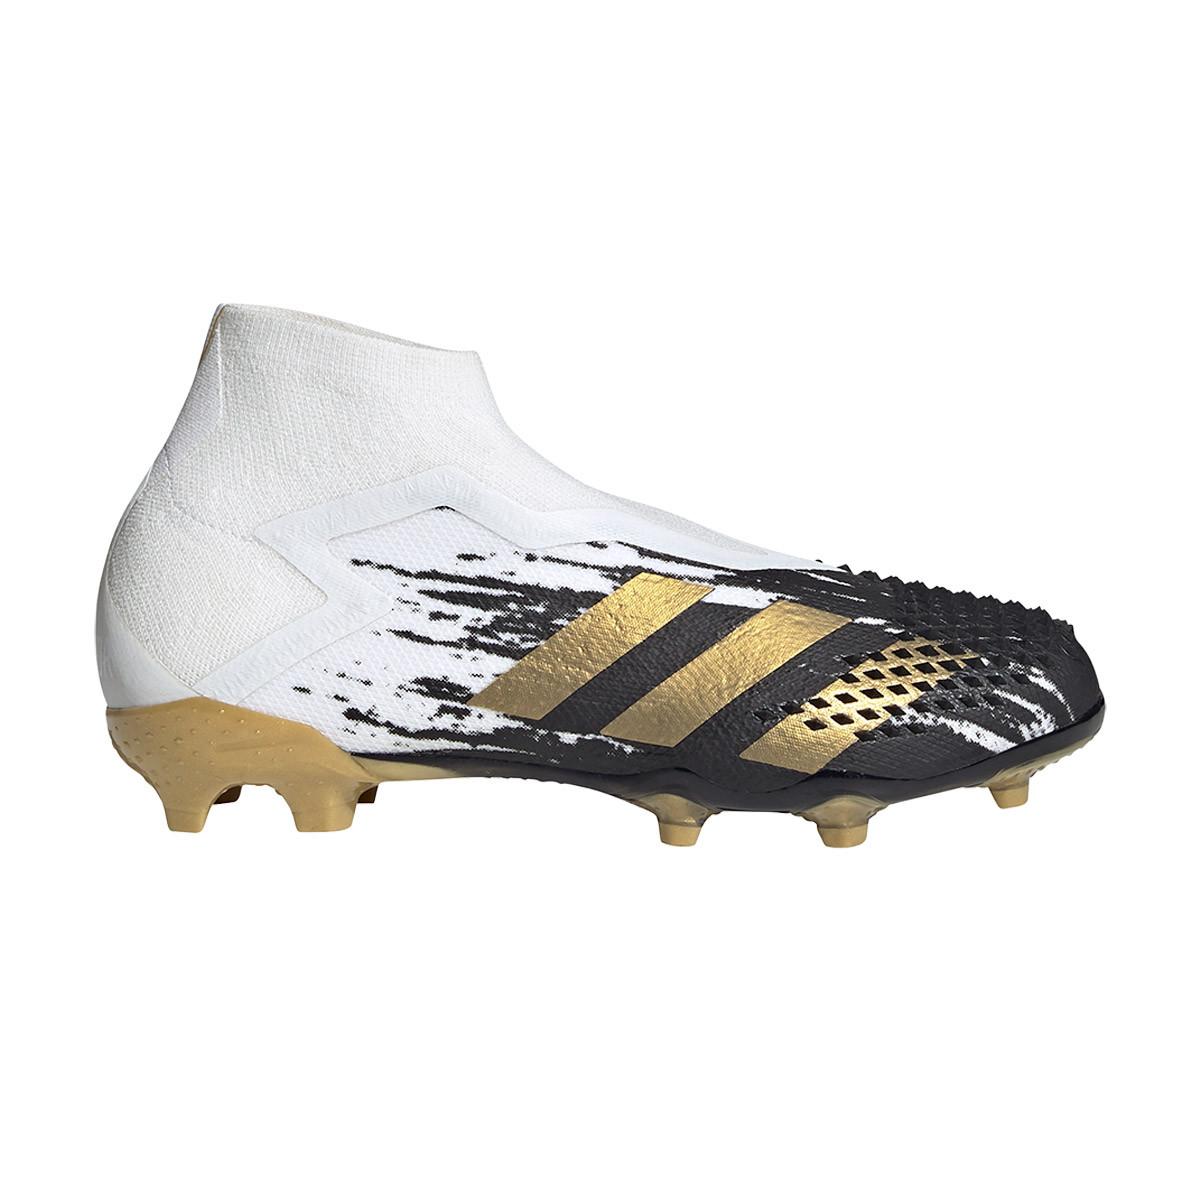 Vamp ula ula ula ula Rebula back to normal? _ Football shoes _ What is worth it?